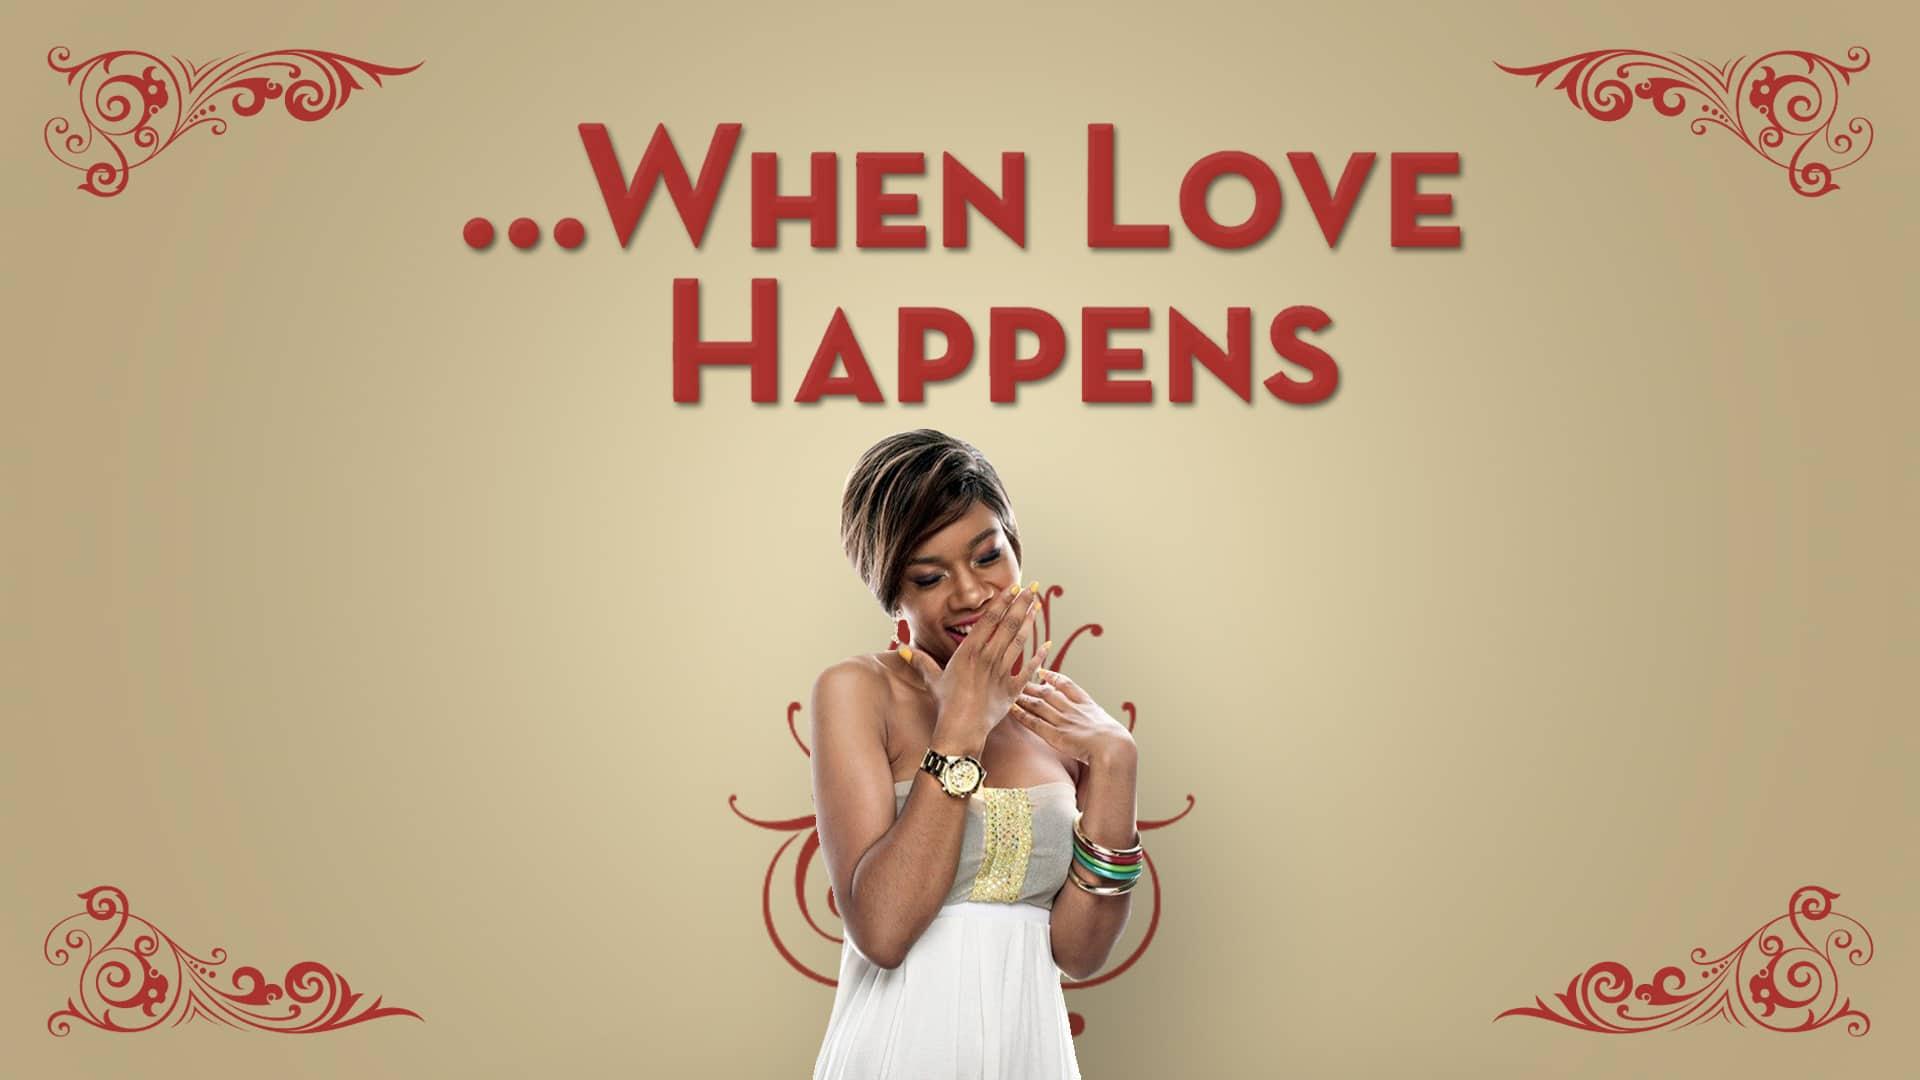 When Love Happens Poster 1920x1080 16x9